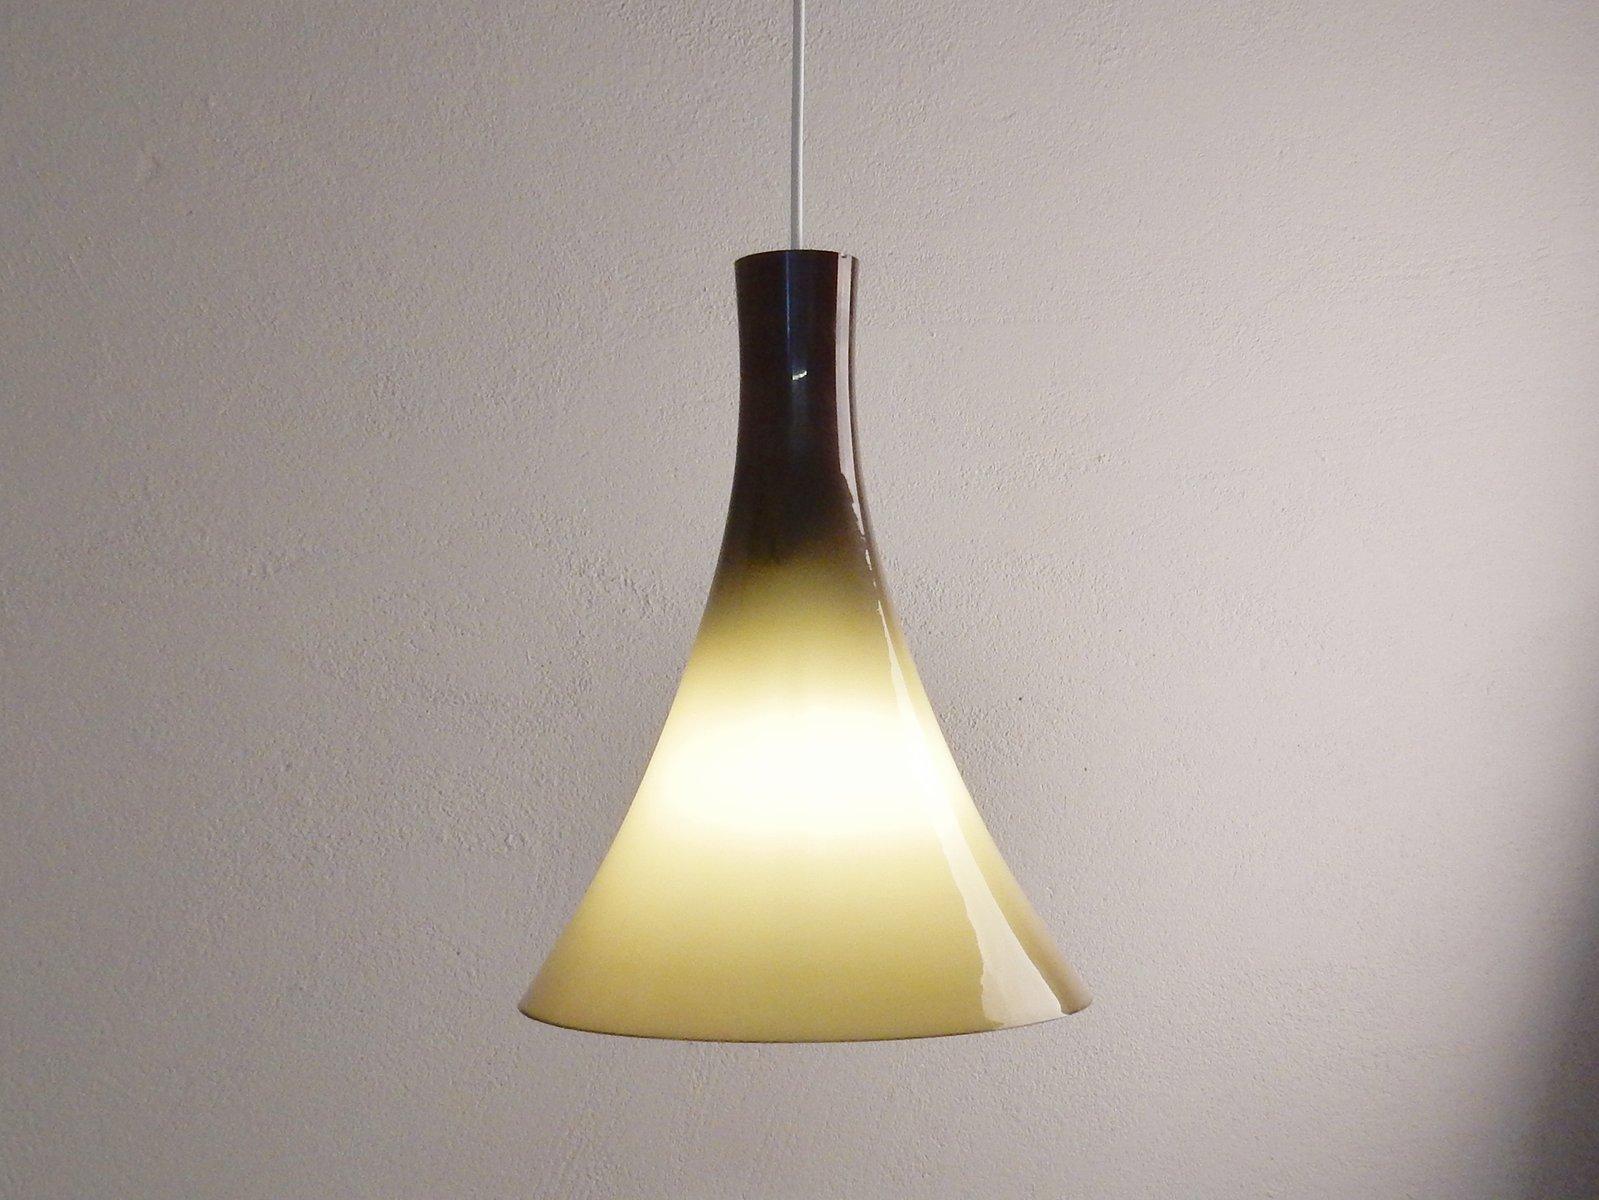 Lampade A Sospensione Vintage : Lampade a sospensione in vetro vintage acquista anouk lampada a